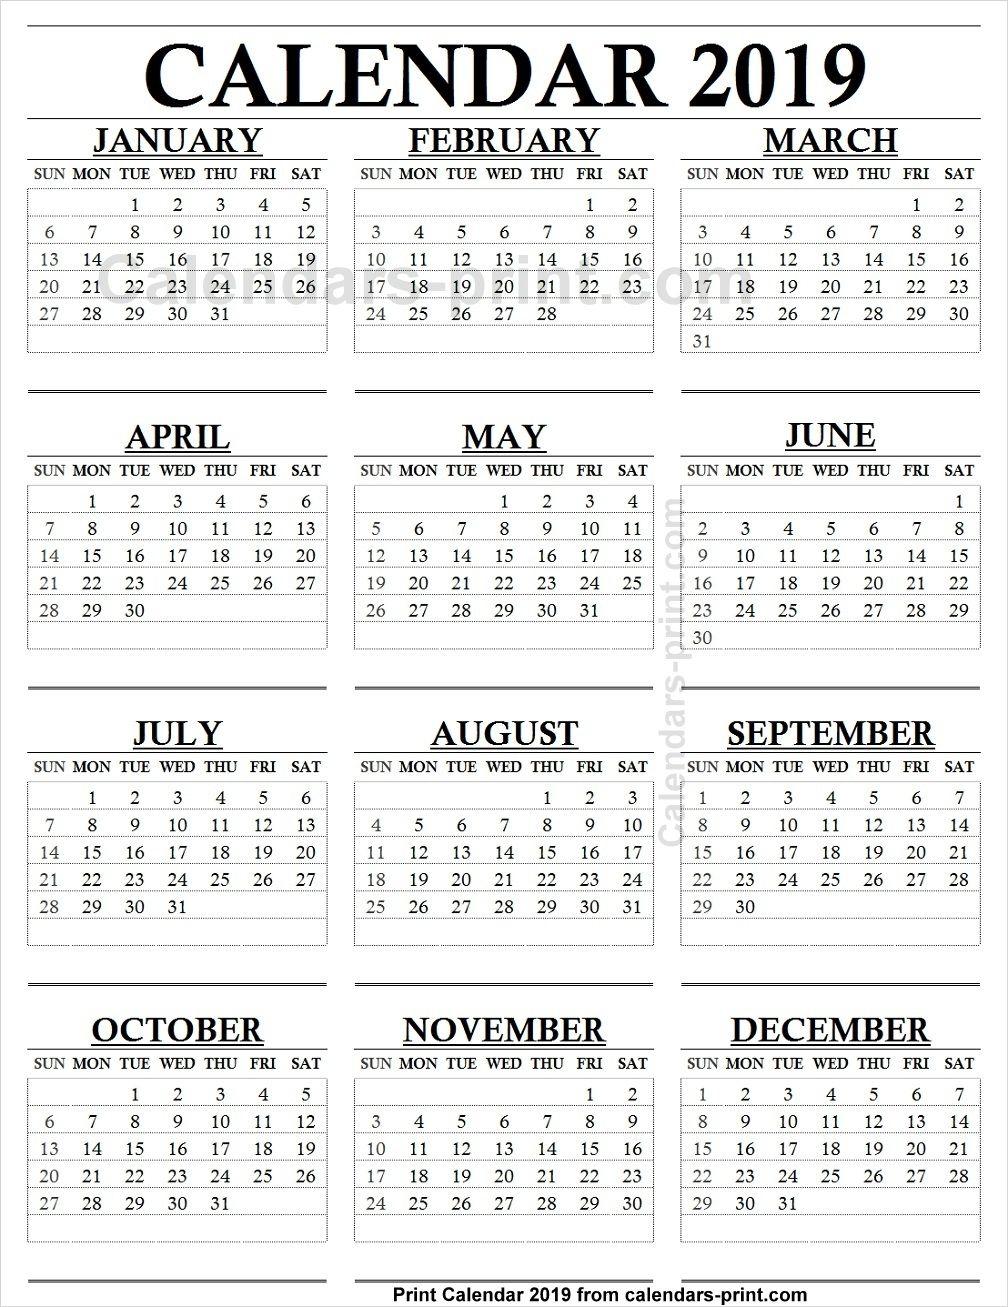 12 Month Calendar 2019 One Page To Print Free | Blank Pdf regarding Blank 12 Month Calendar